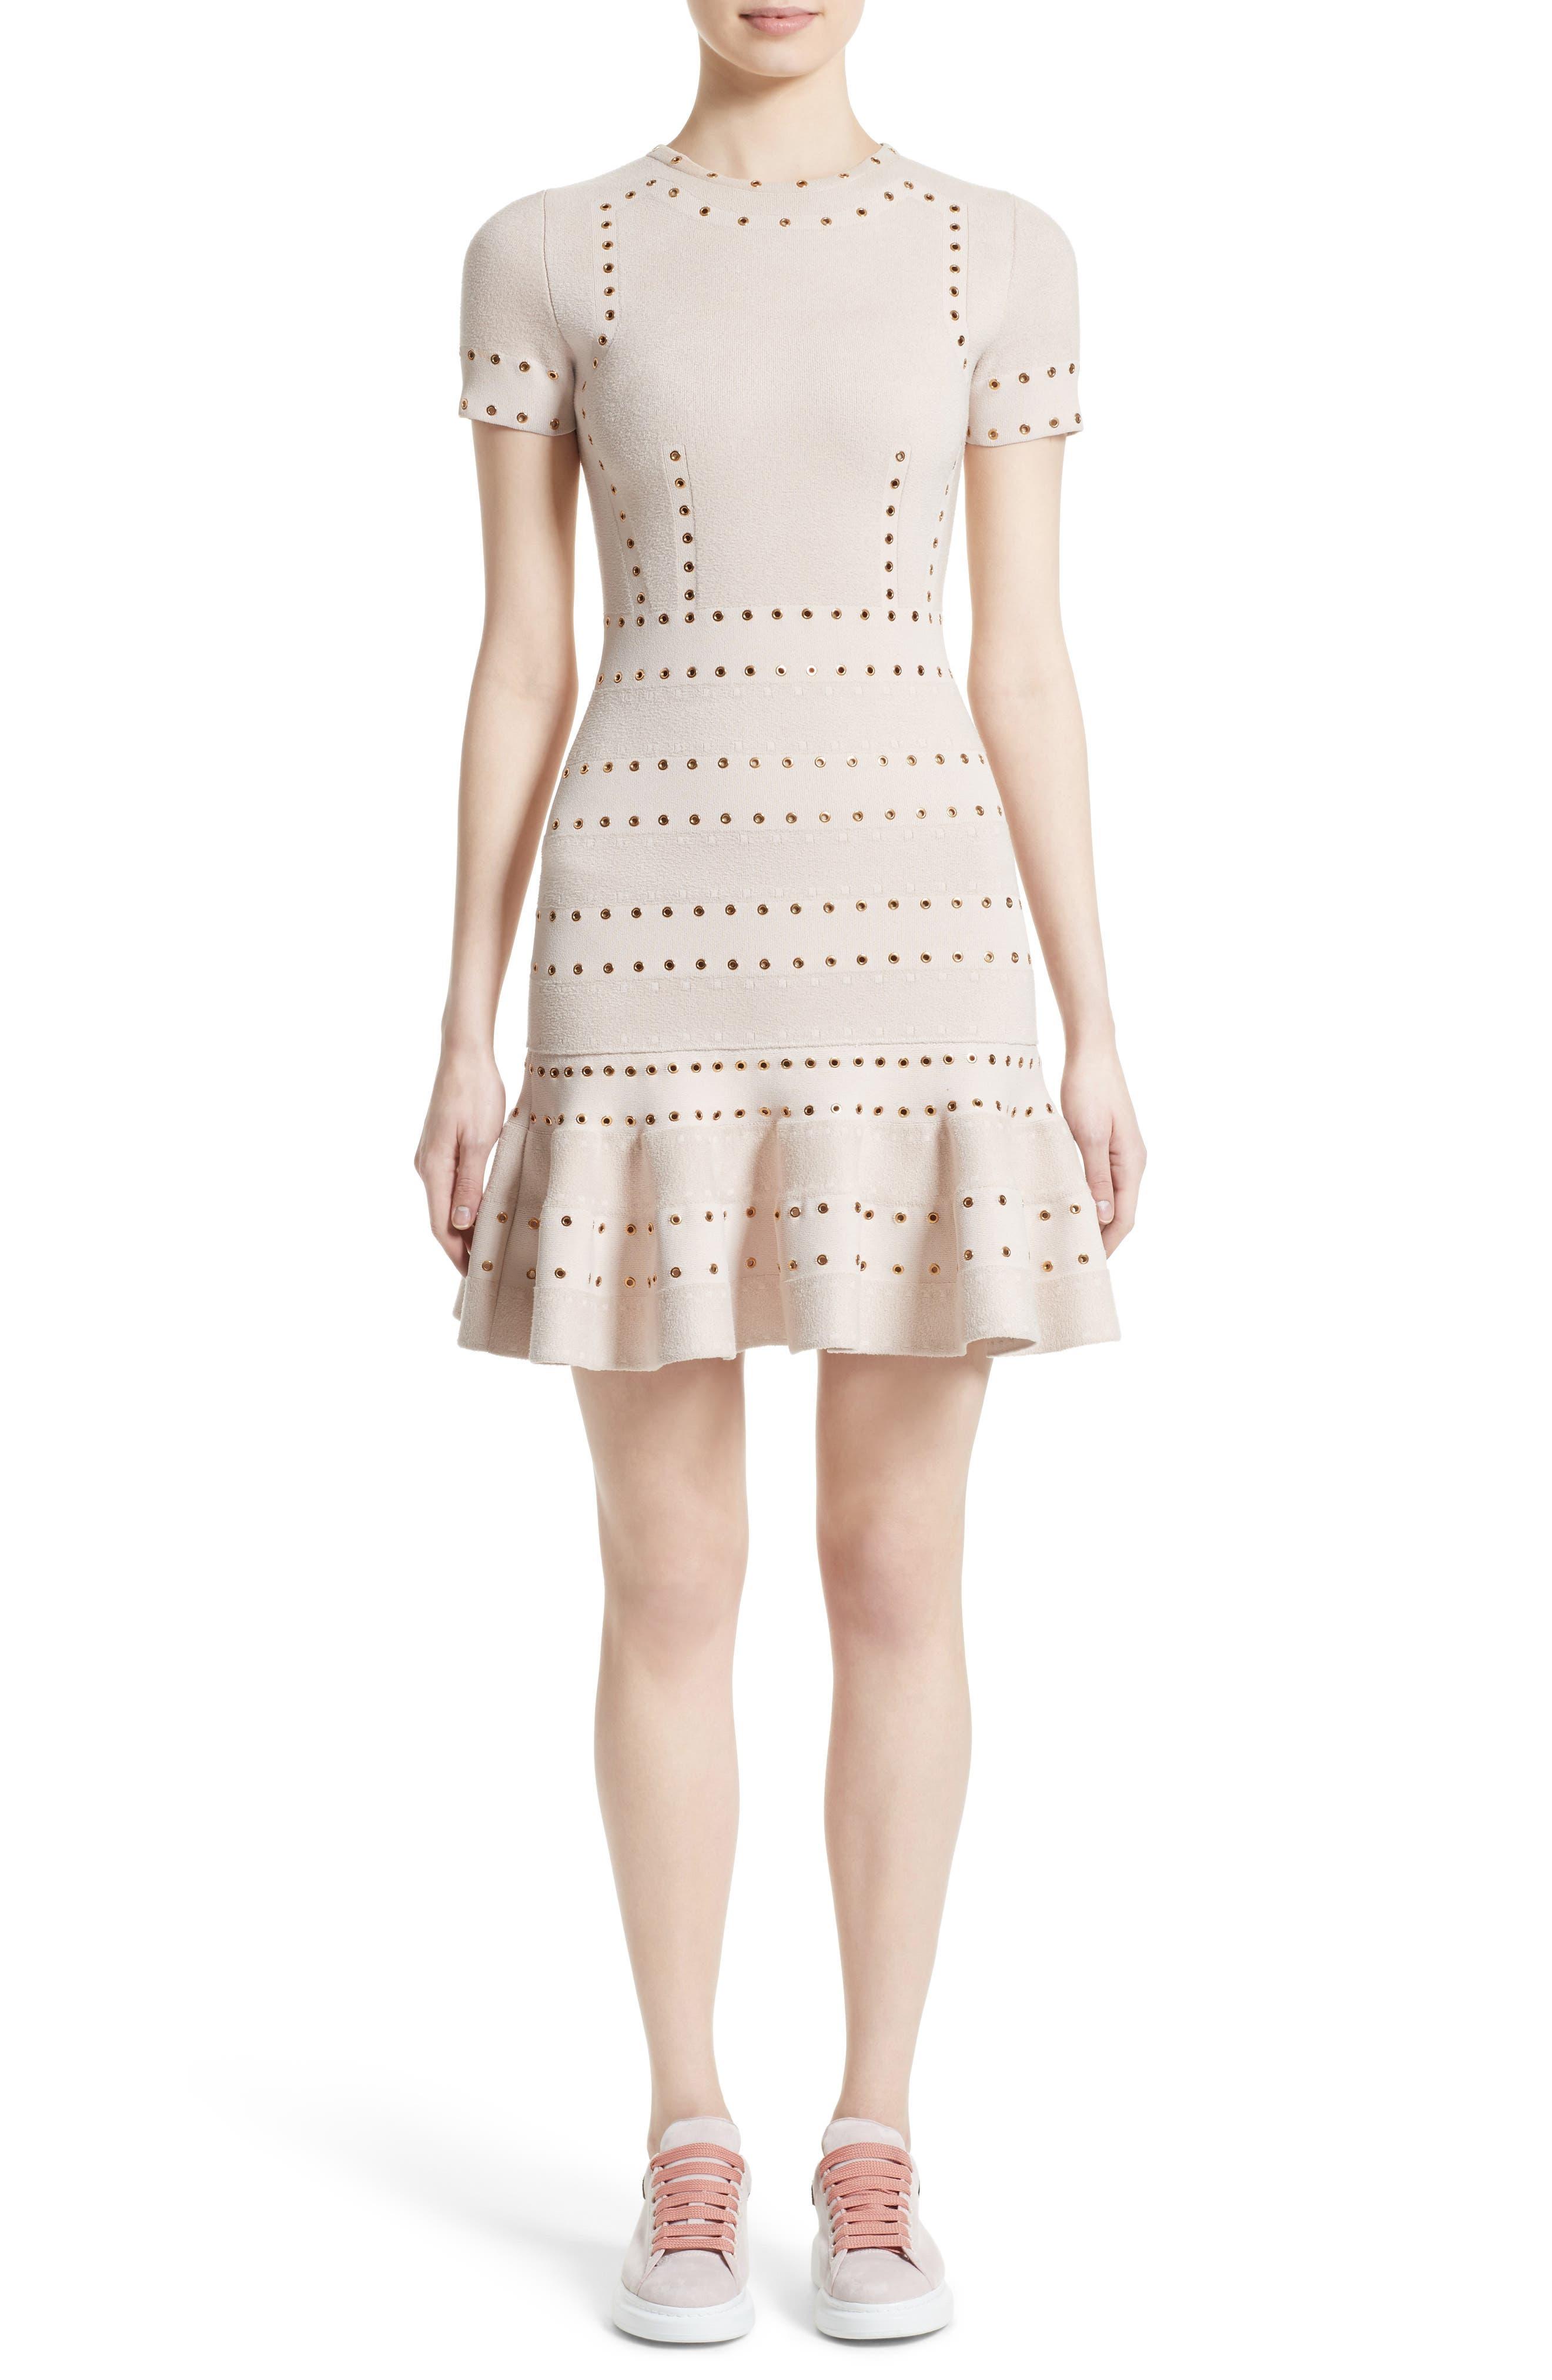 Main Image - Alexander McQueen Eyelet Detail Knit Dress